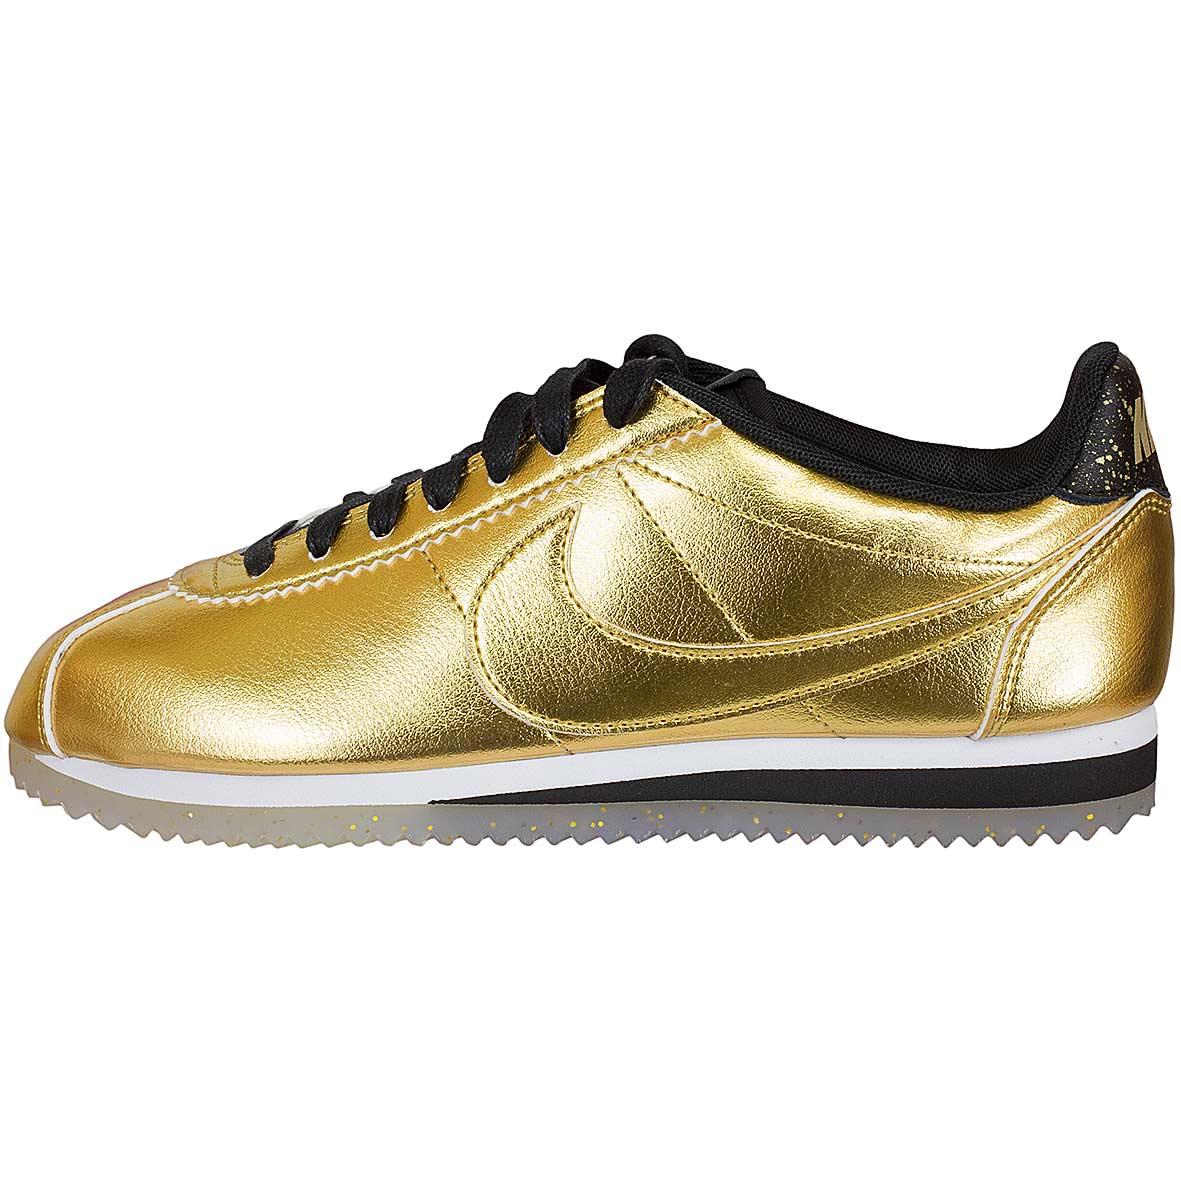 lowest price a660a 04bea ☆ Nike Damen Sneaker Classic Cortez Leather SE metal gold - hier ...